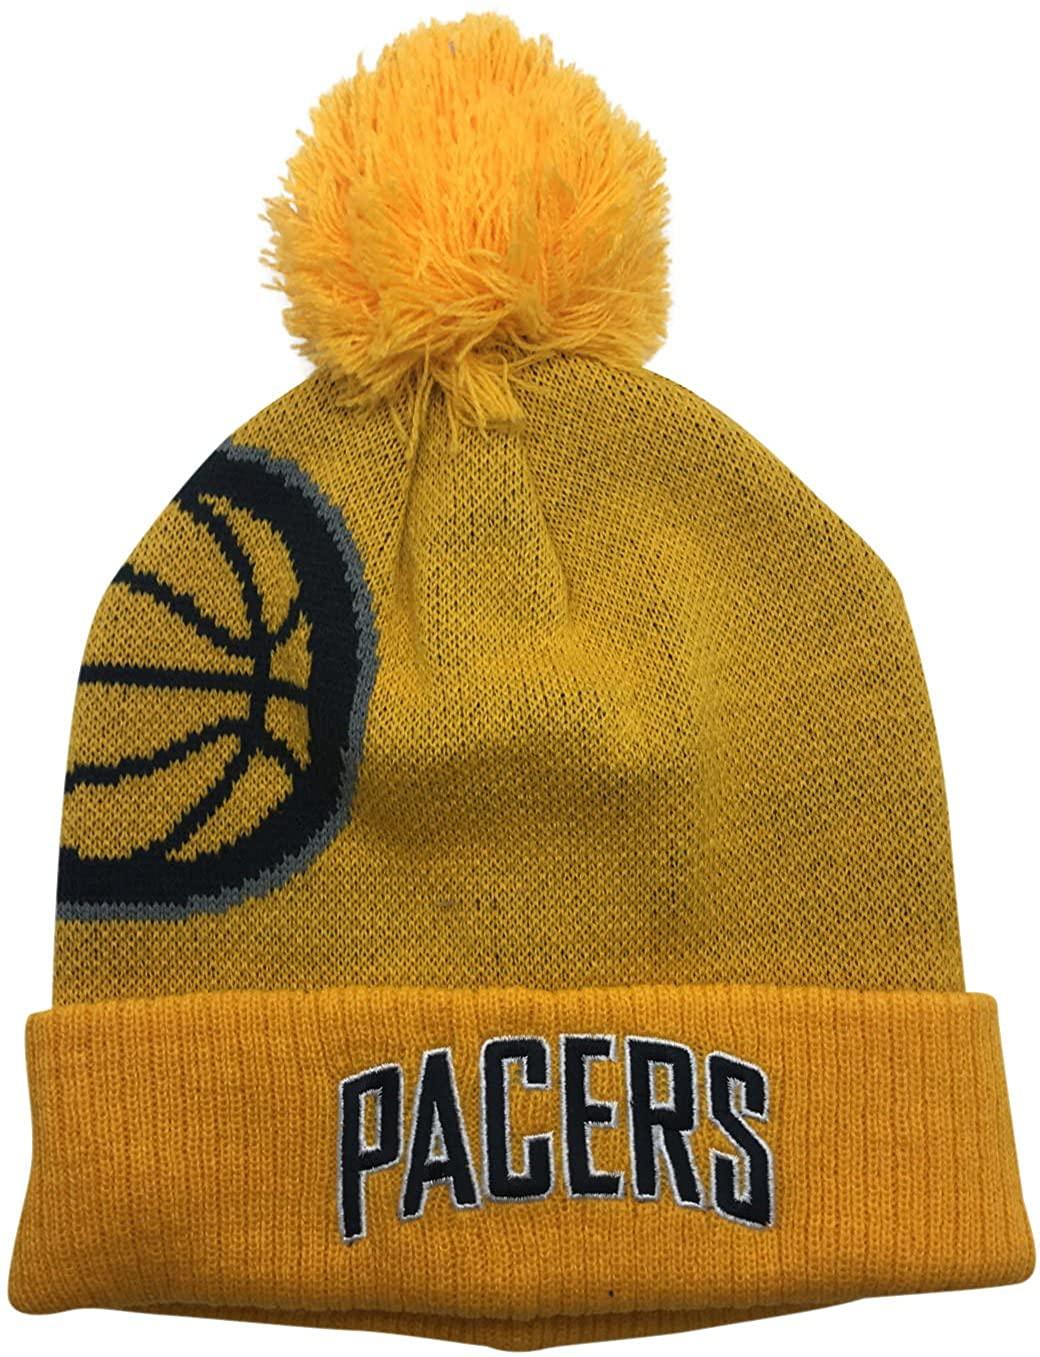 Reebok NBA Indiana Pacers POM Knit Beanie Hat Yellow